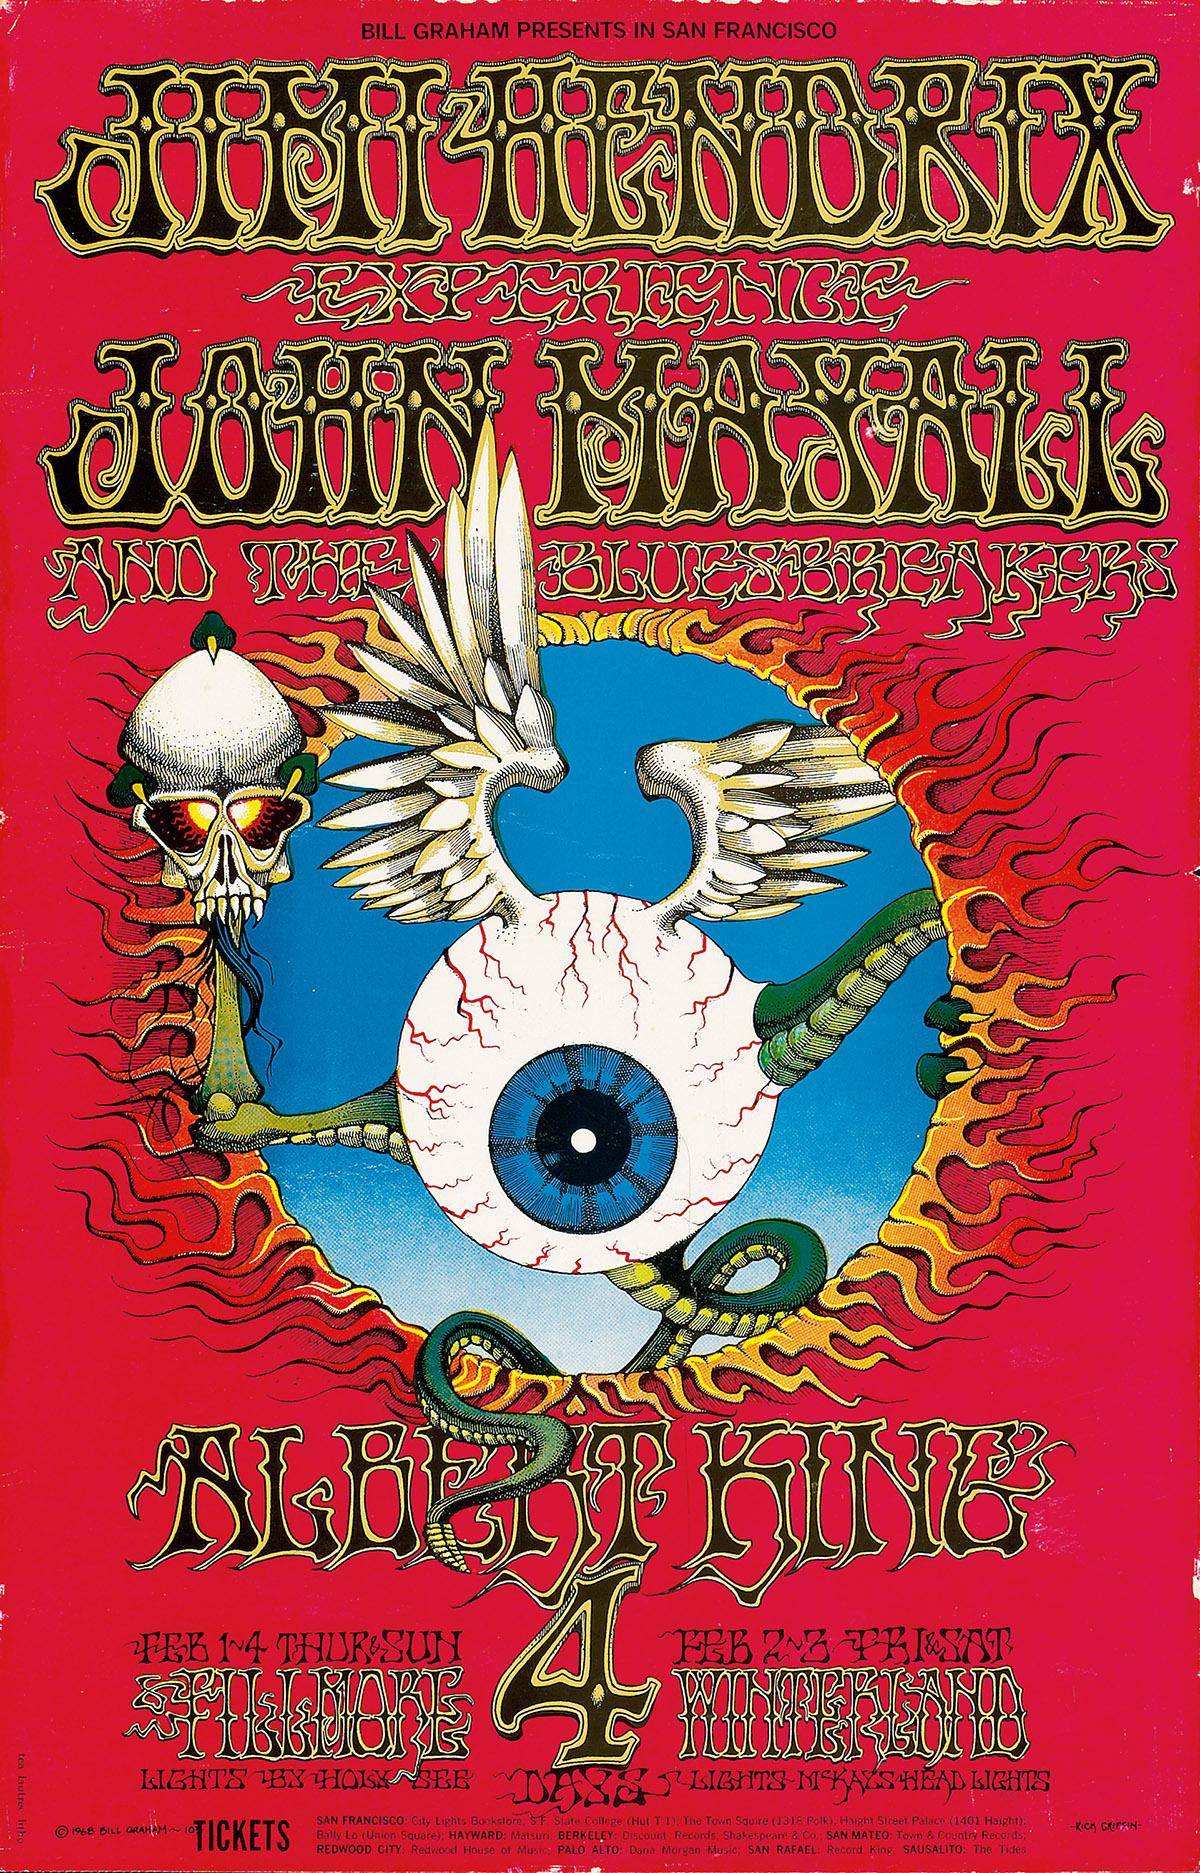 RICK-GRIFFIN-(1944-1991)-JIMI-HENDRIX-EXPERIENCE--JOHN-MAYAL